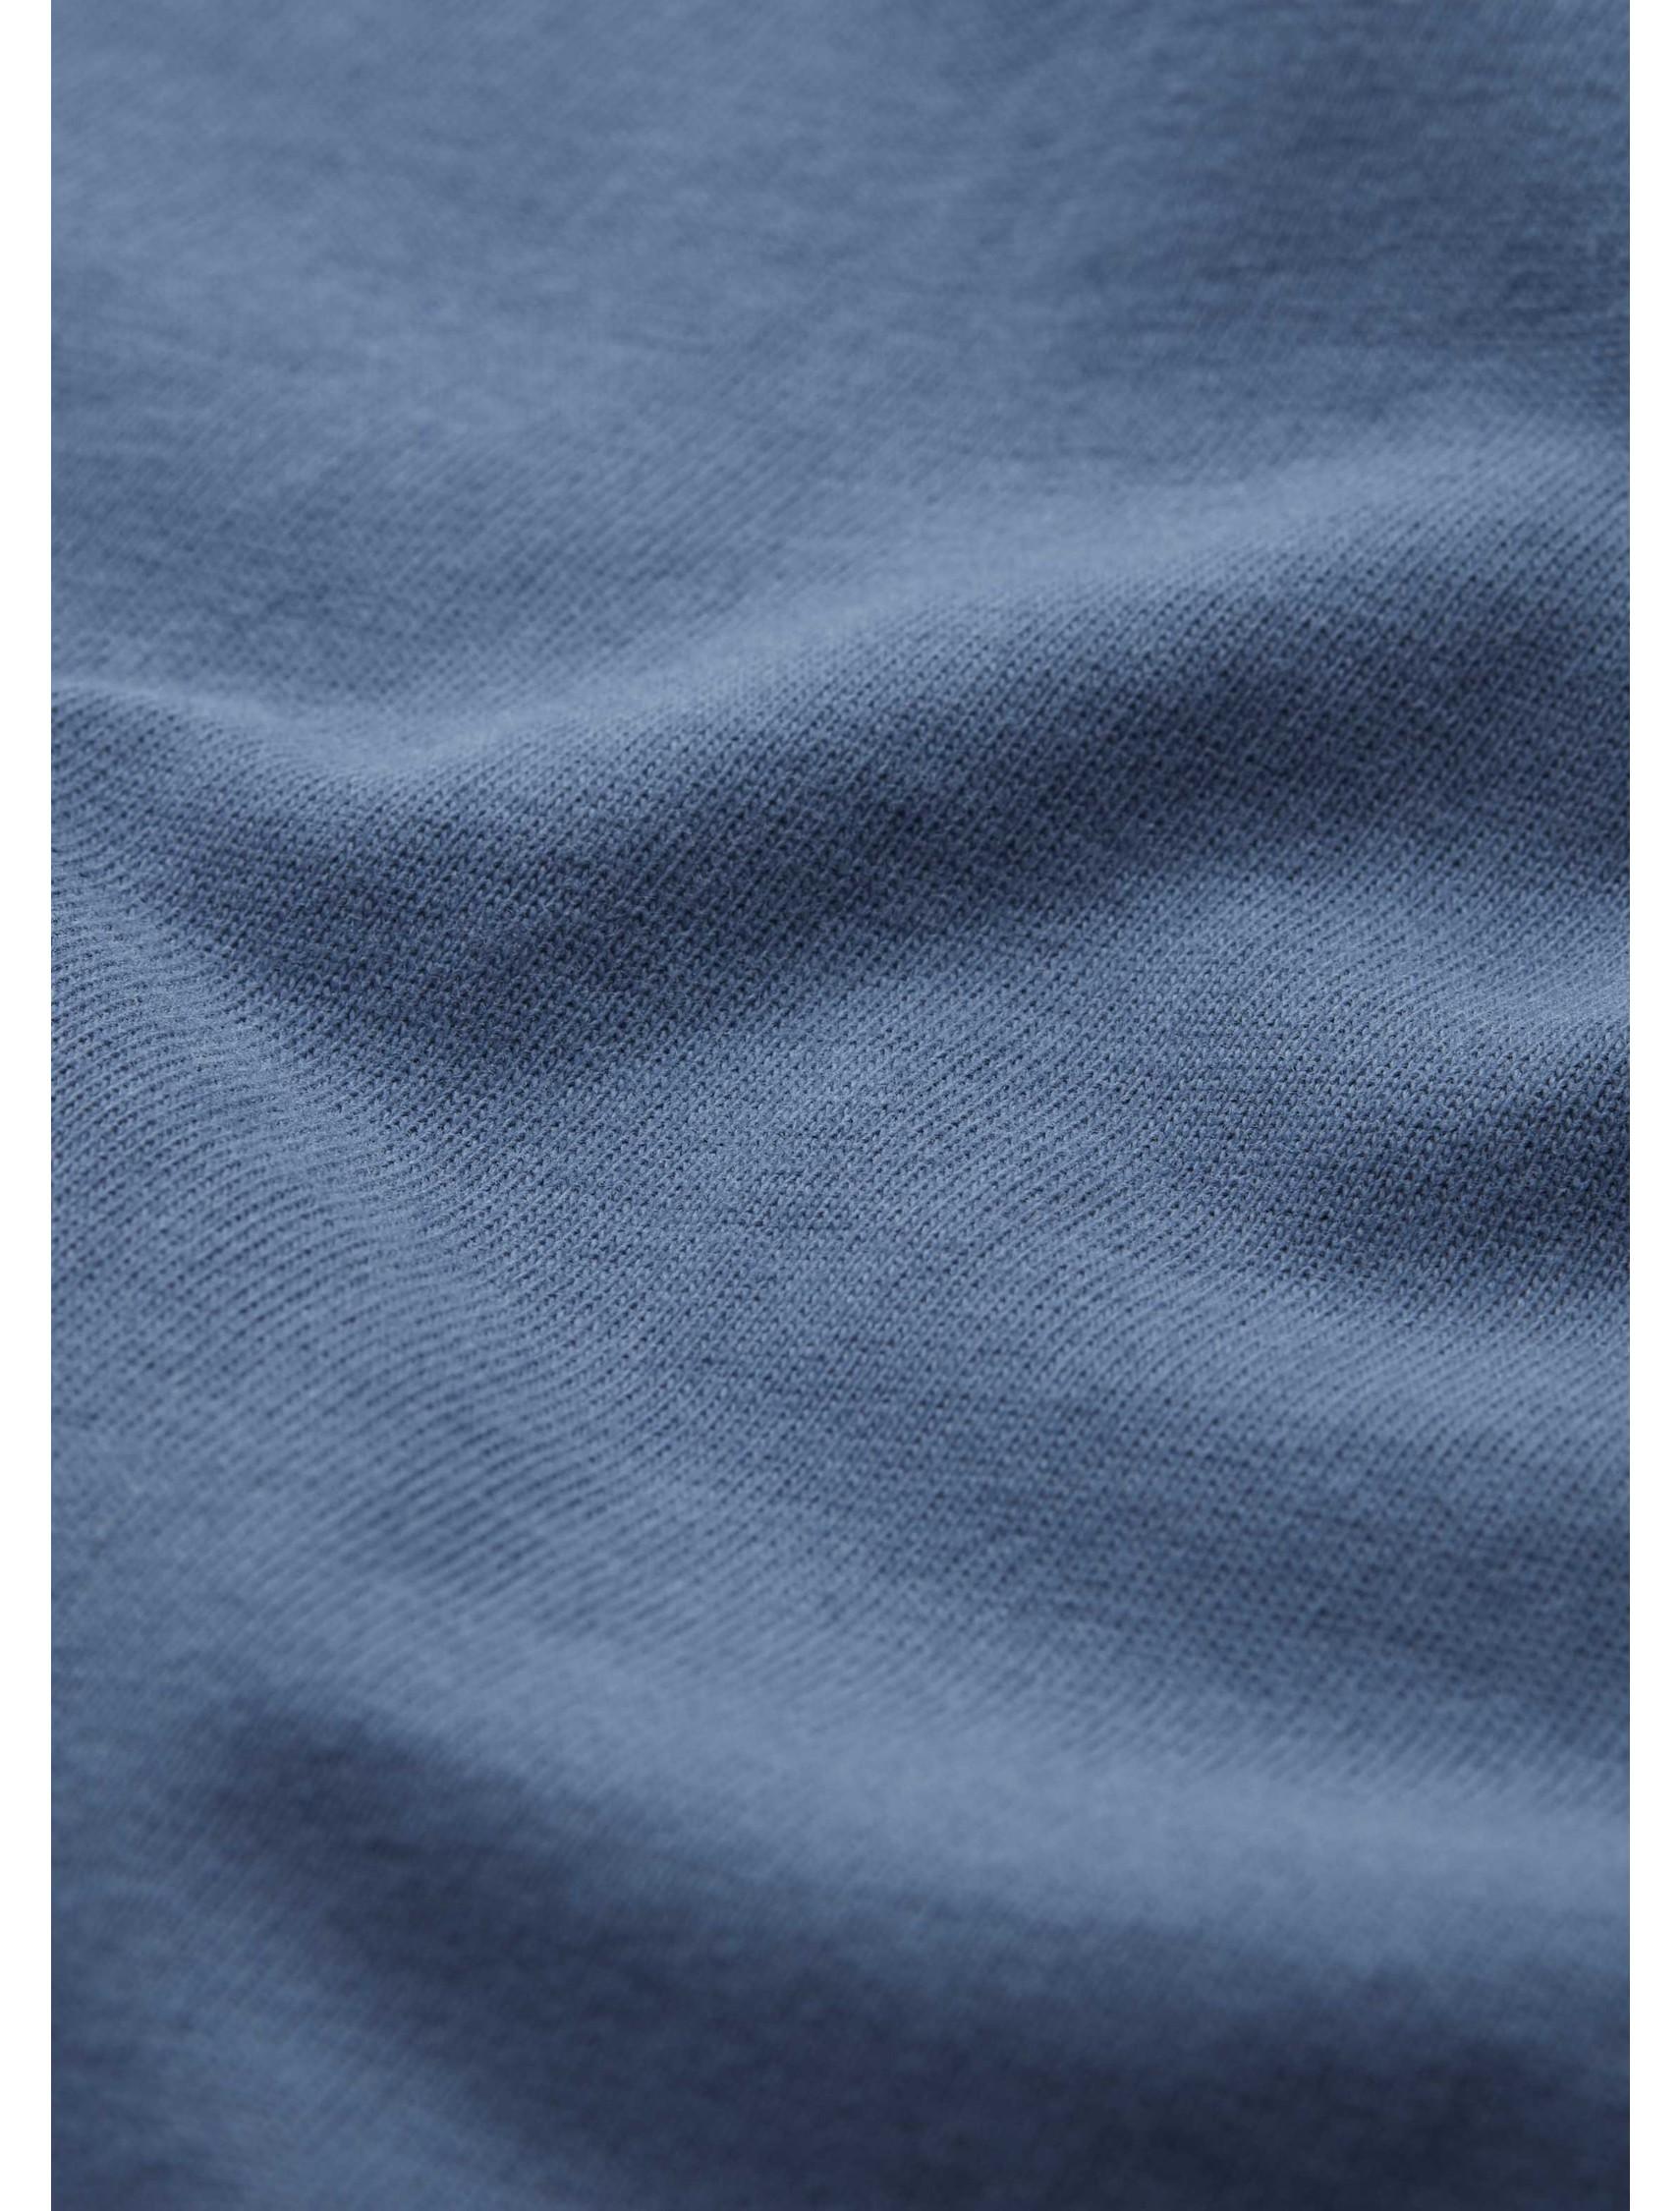 Hometown Tee - Charcoal Blue